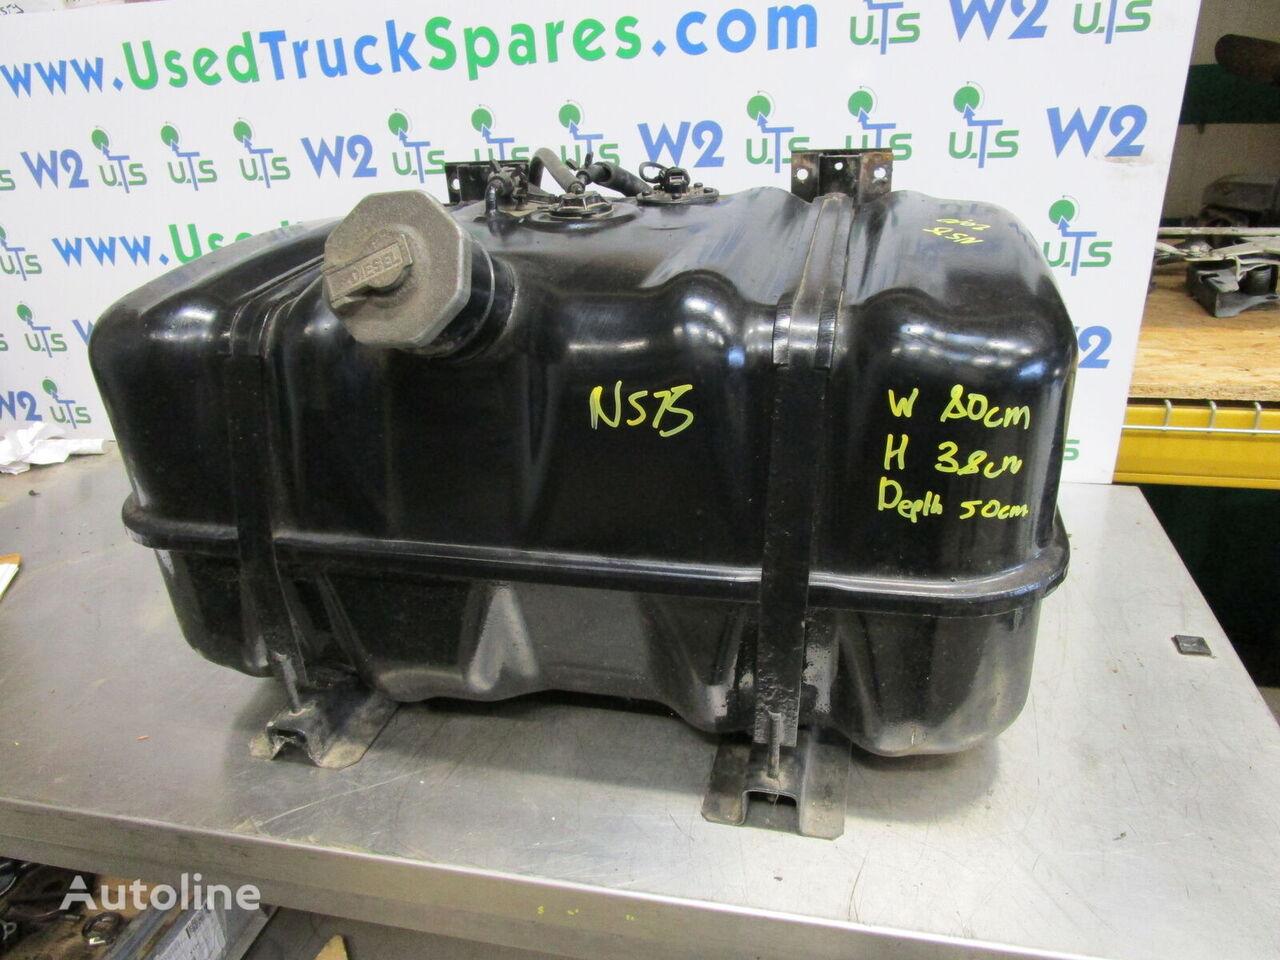 ISUZU N75 fuel tank for truck